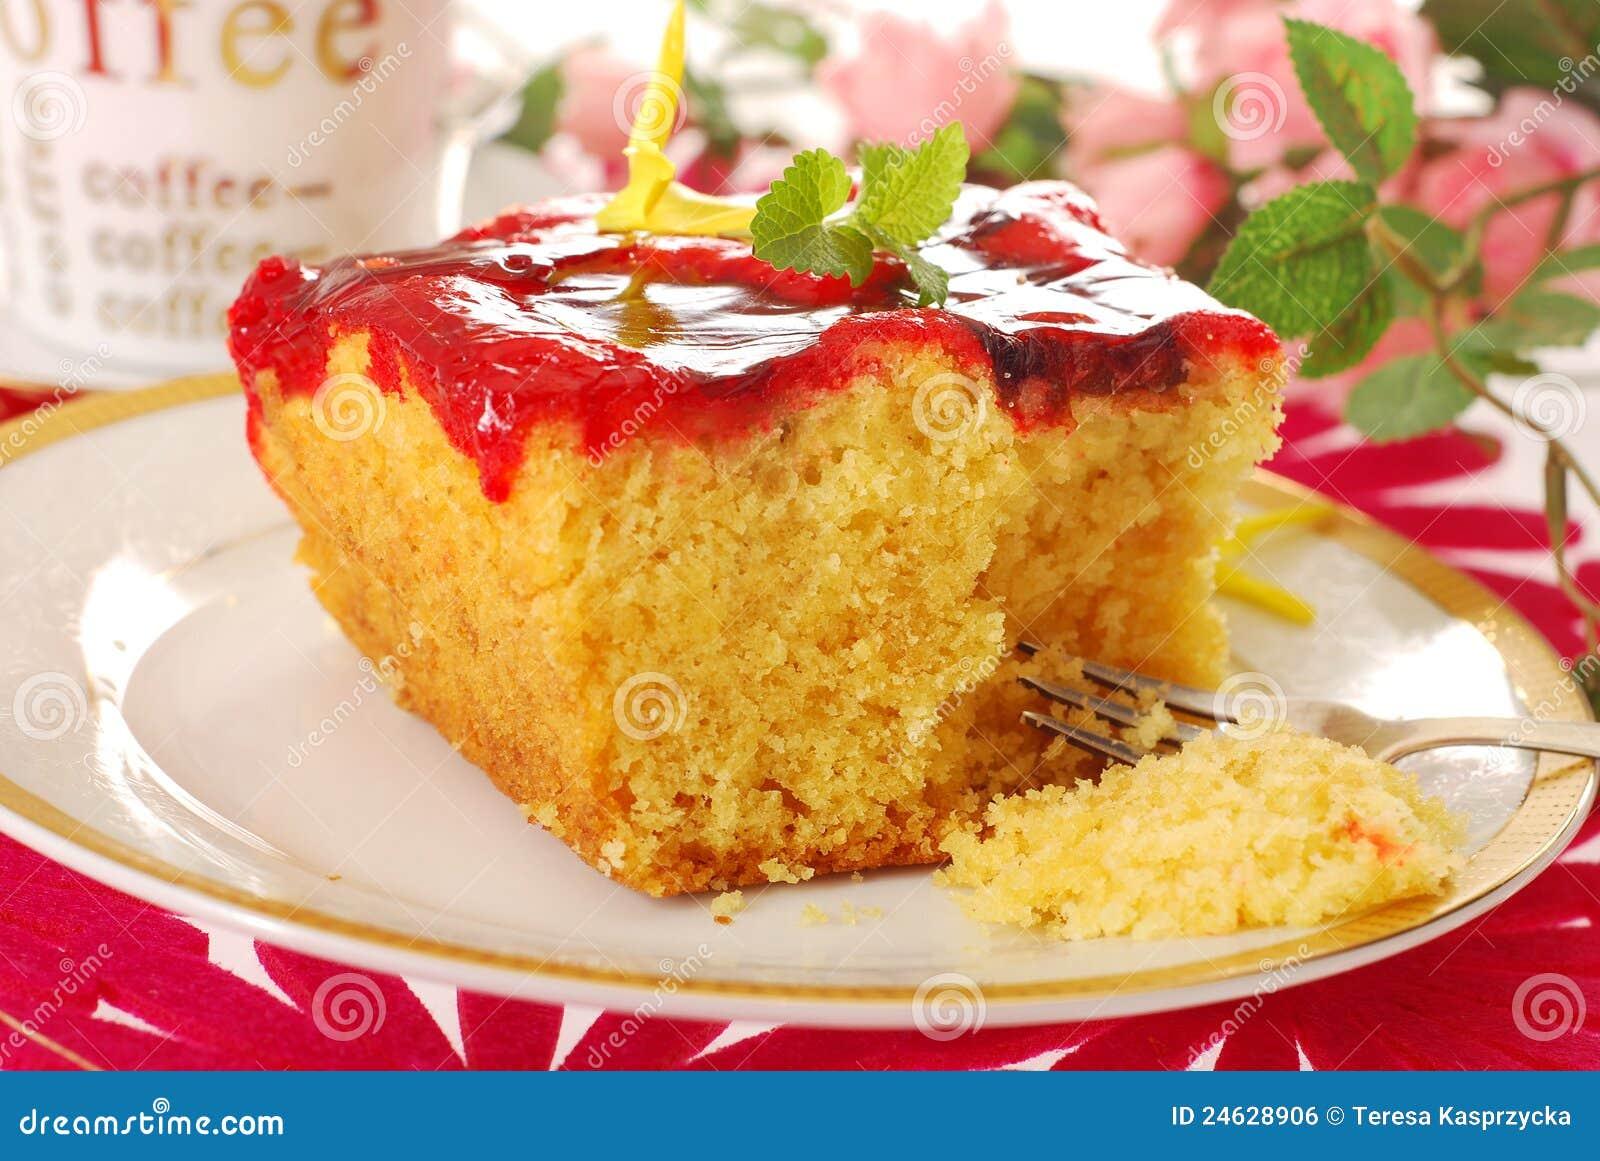 Cake With Fruit Yogurt : Yogurt Cake With Fruit Jelly Royalty Free Stock Image ...